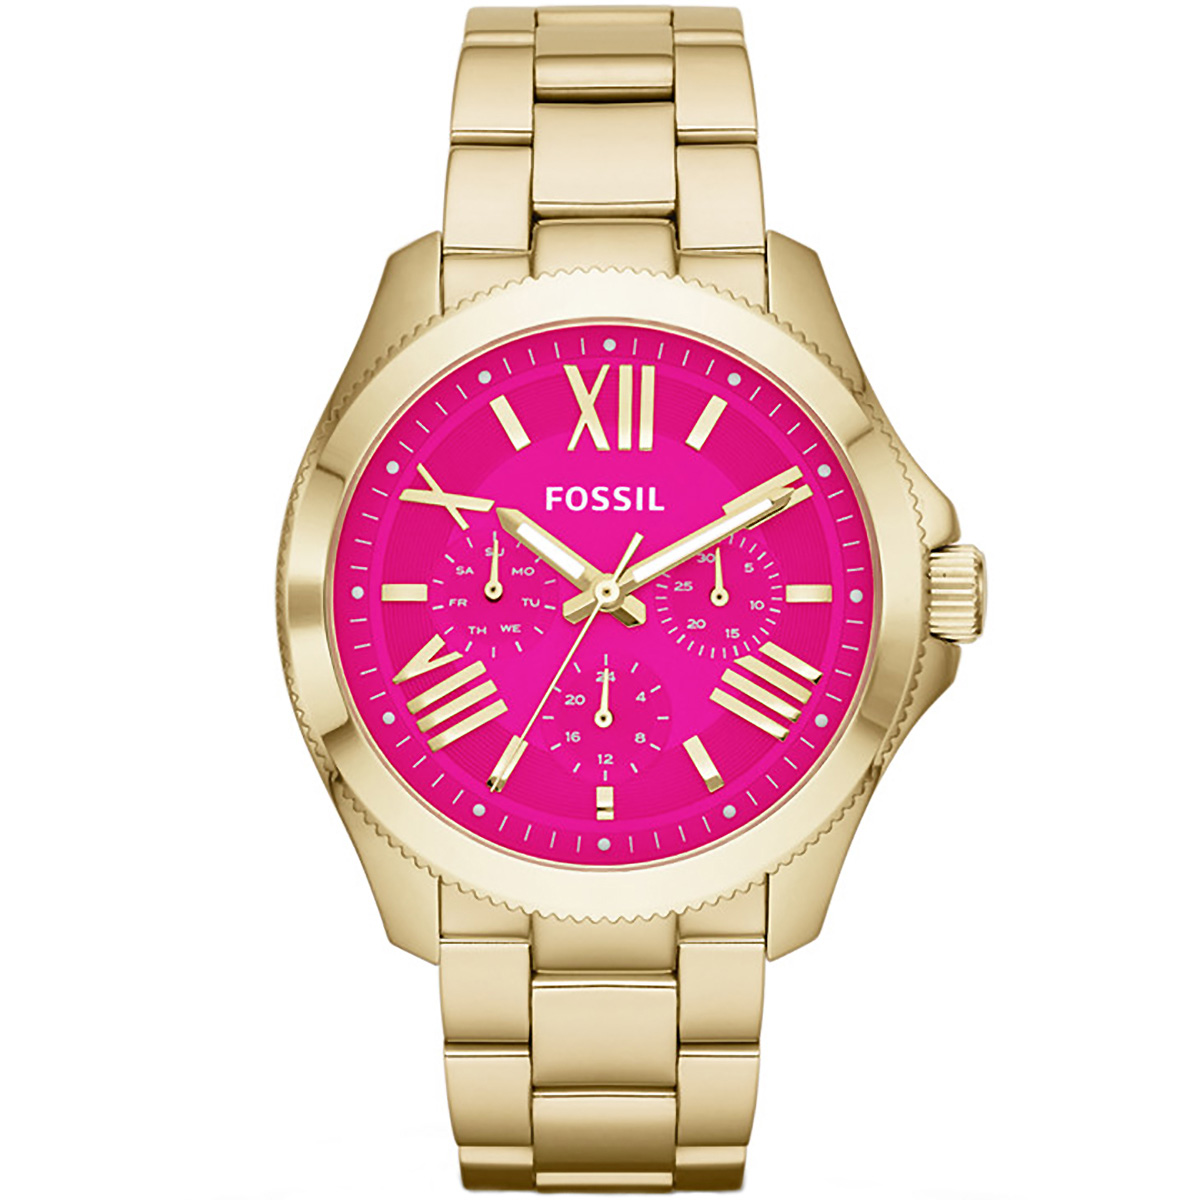 Damenuhren fossil gold  Fossil Uhr Cecile AM4539 Damenuhr Gold Pink Edelstahl Watch NEU & OVP